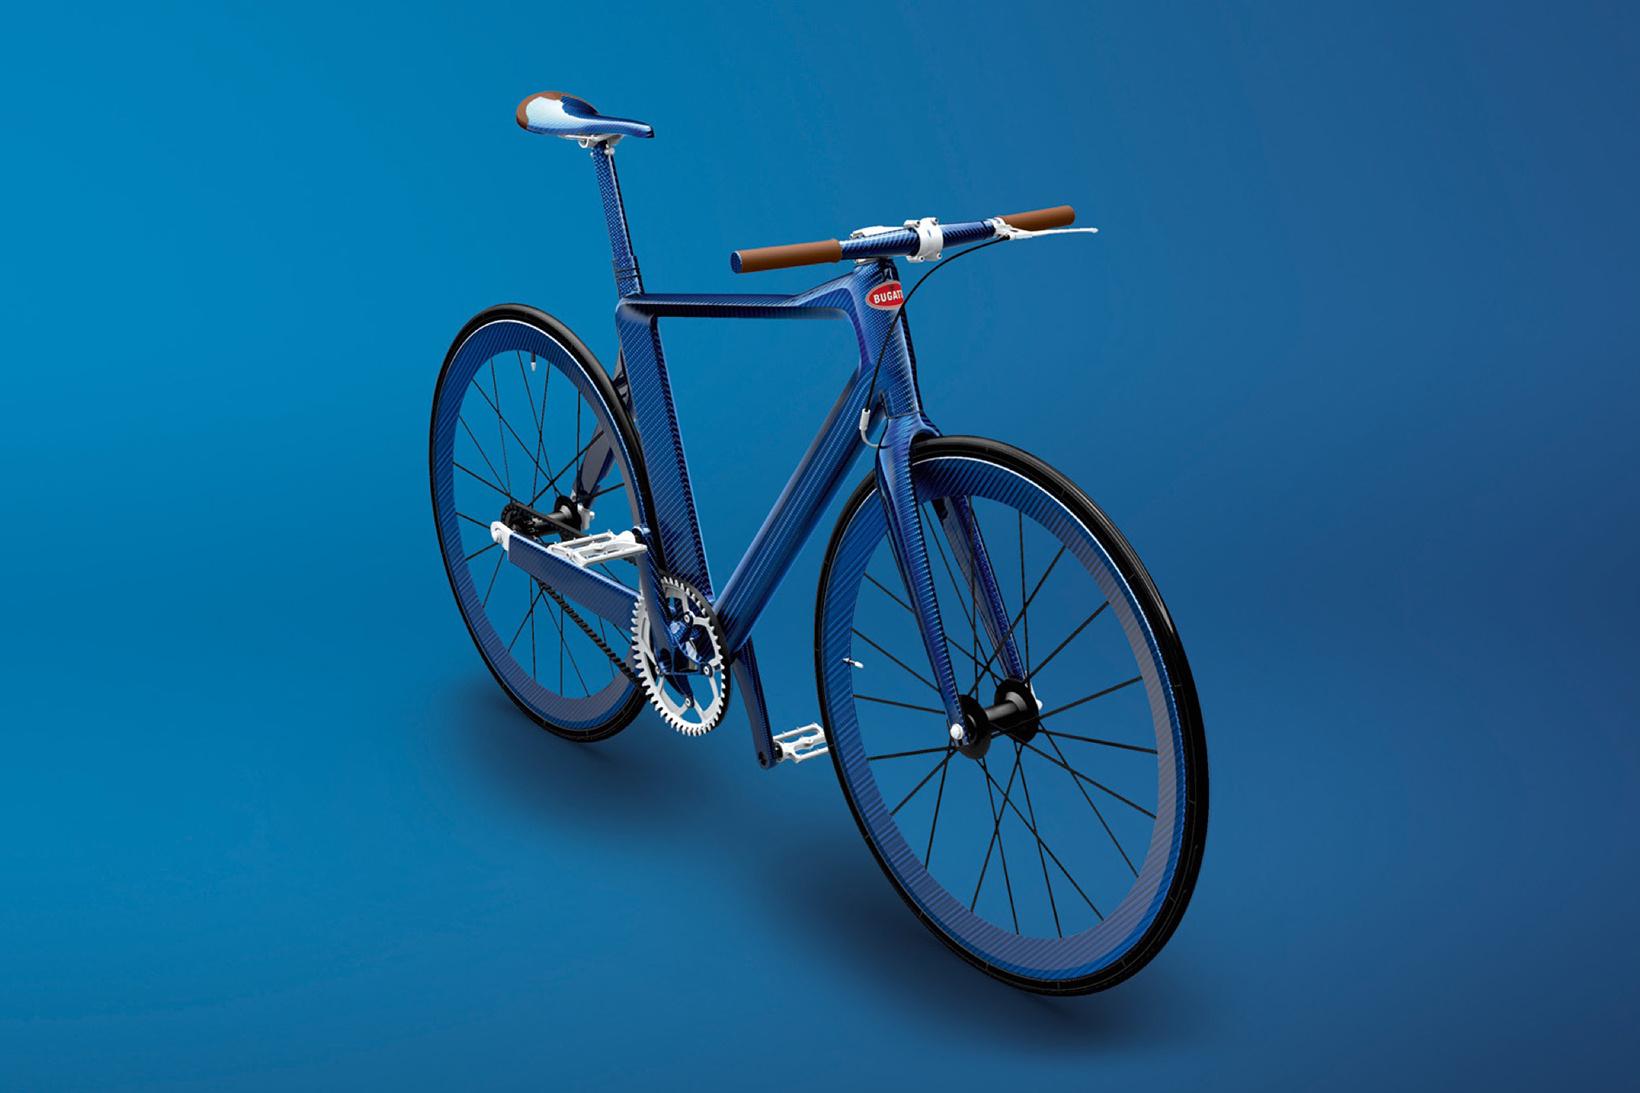 PG Bugatti Bike: Bugattijevo kolo tehta manj kot 5 kilogramov